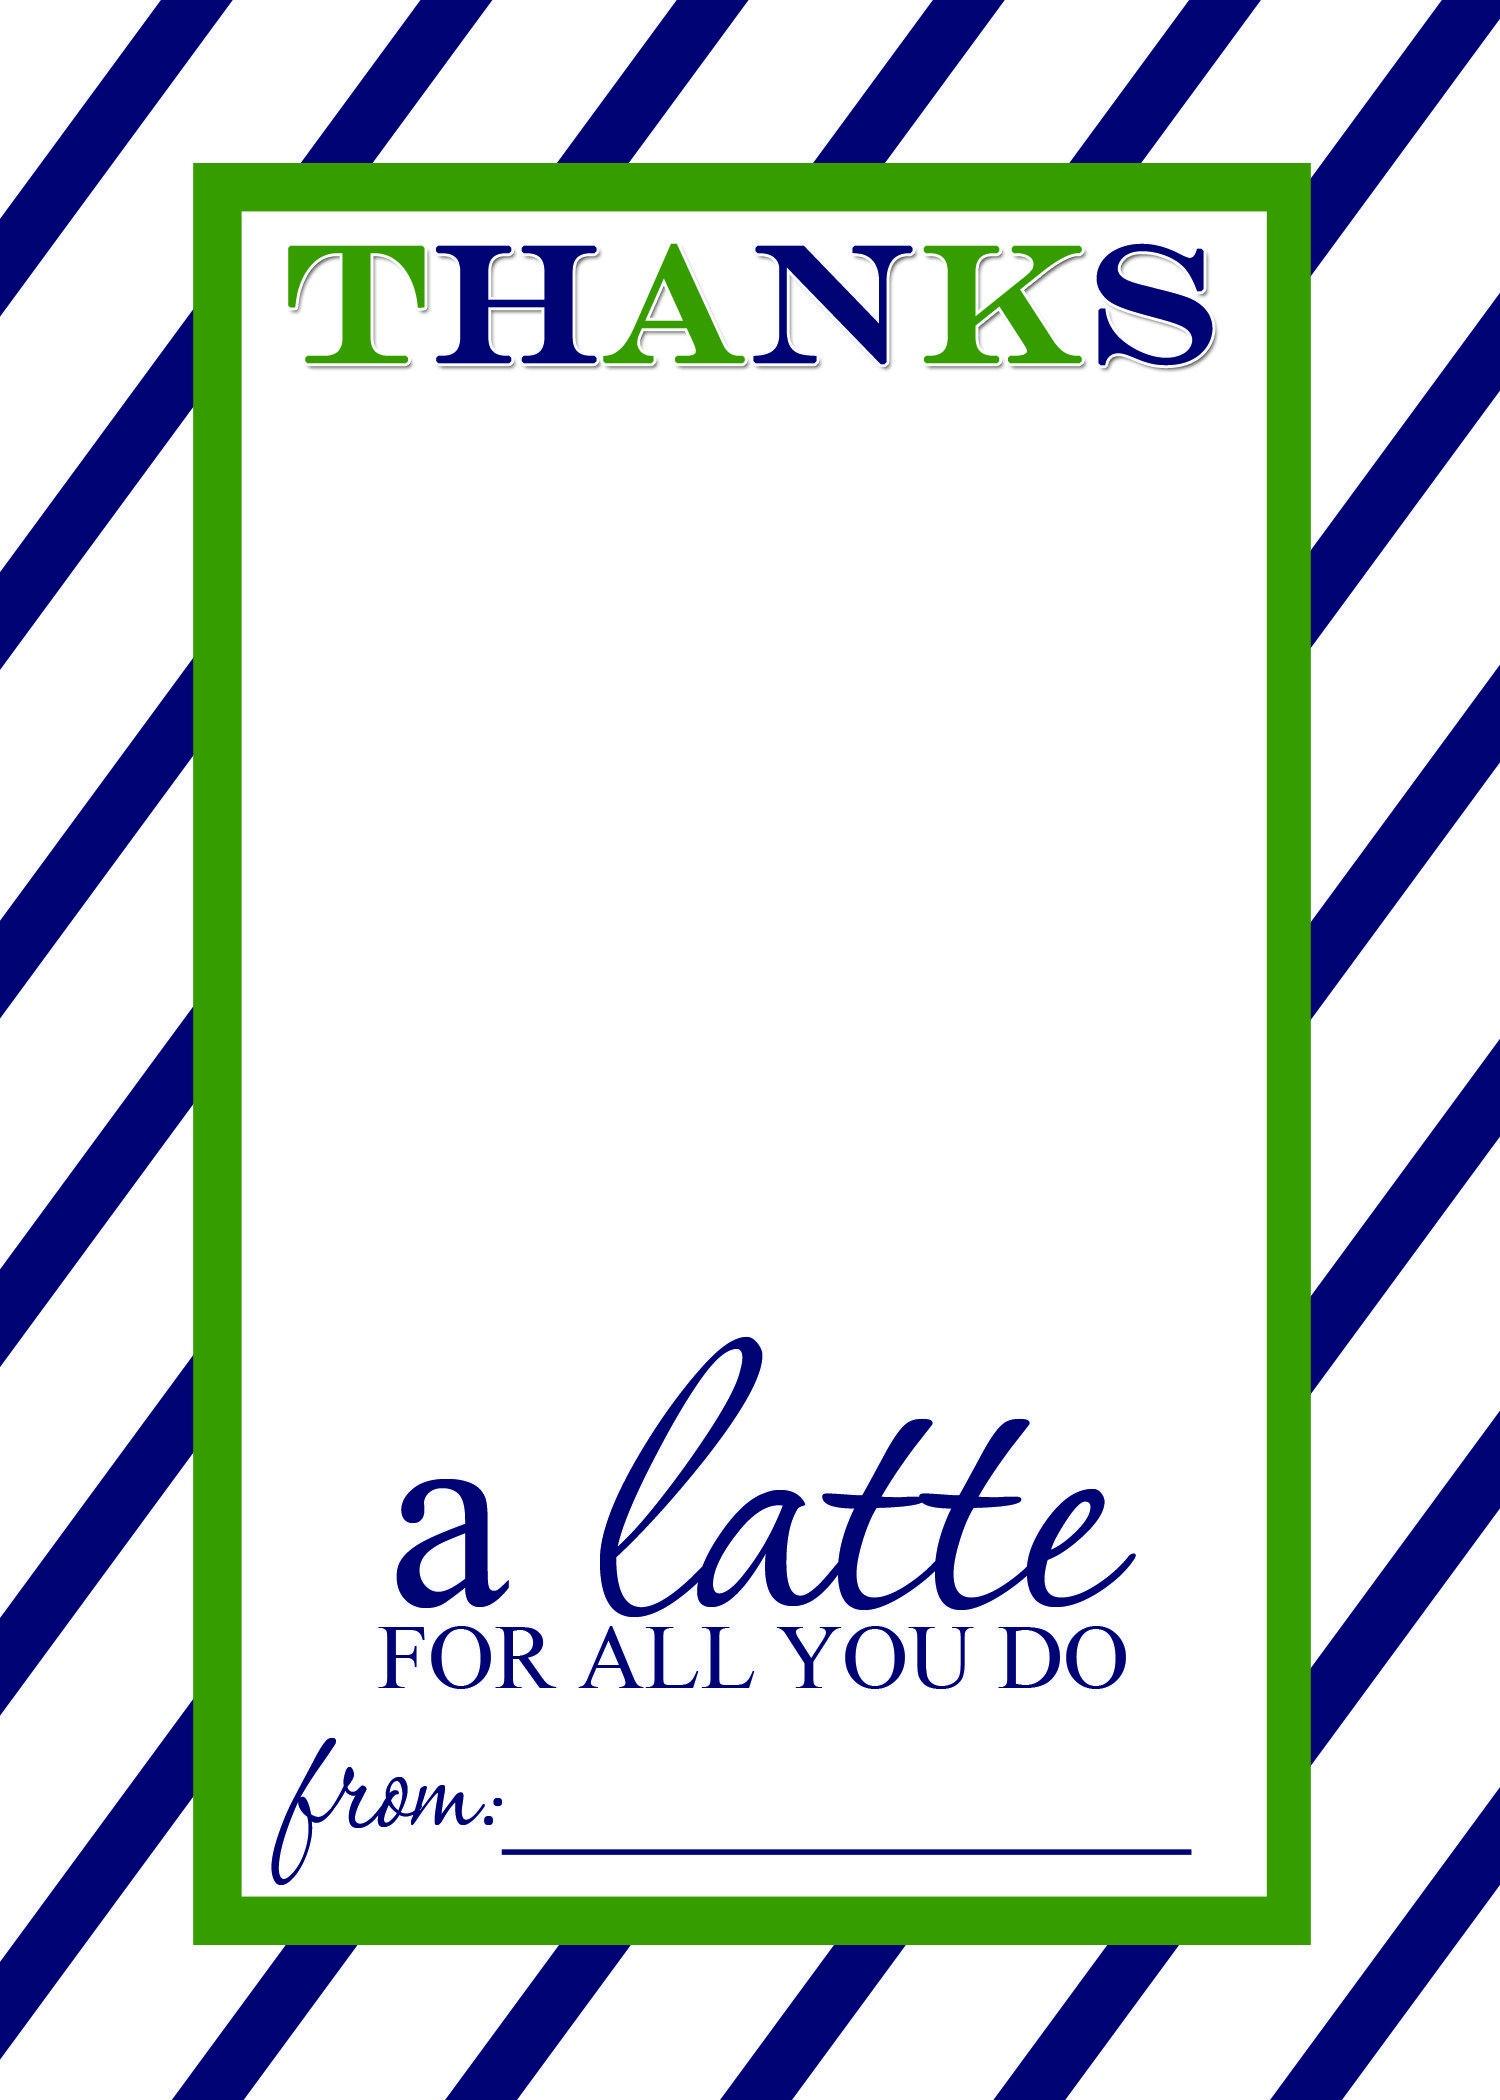 Thanks A Latte Free Printable Gift Card Holder Teacher Gift | Thank - Thanks A Latte Free Printable